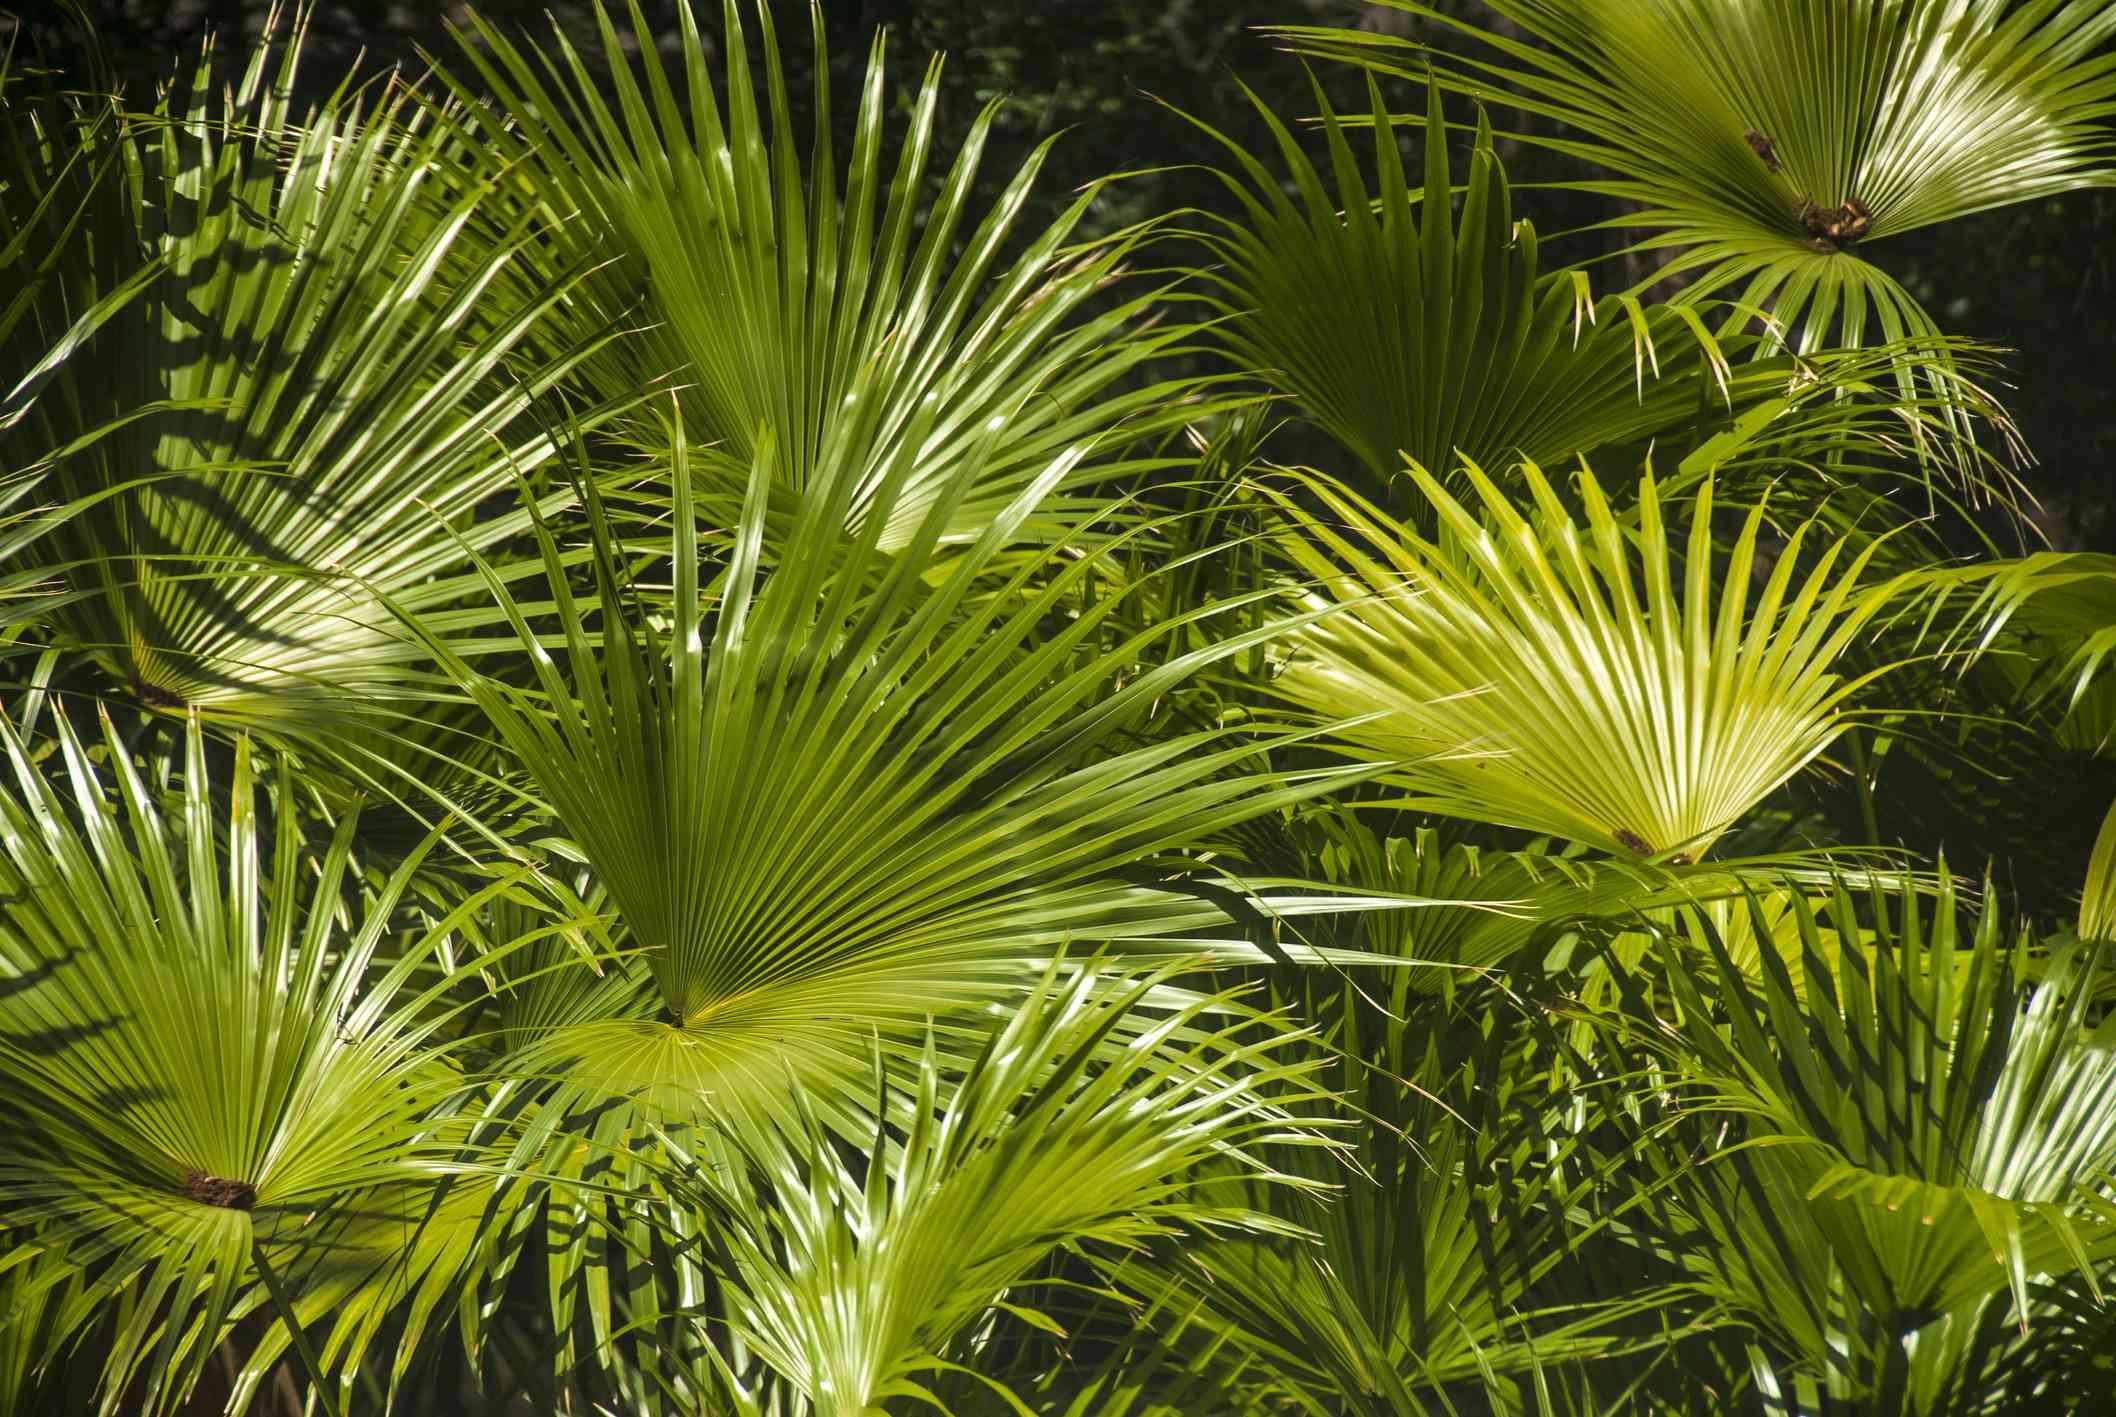 Dwarf palmetto (Sabal minor) forest.